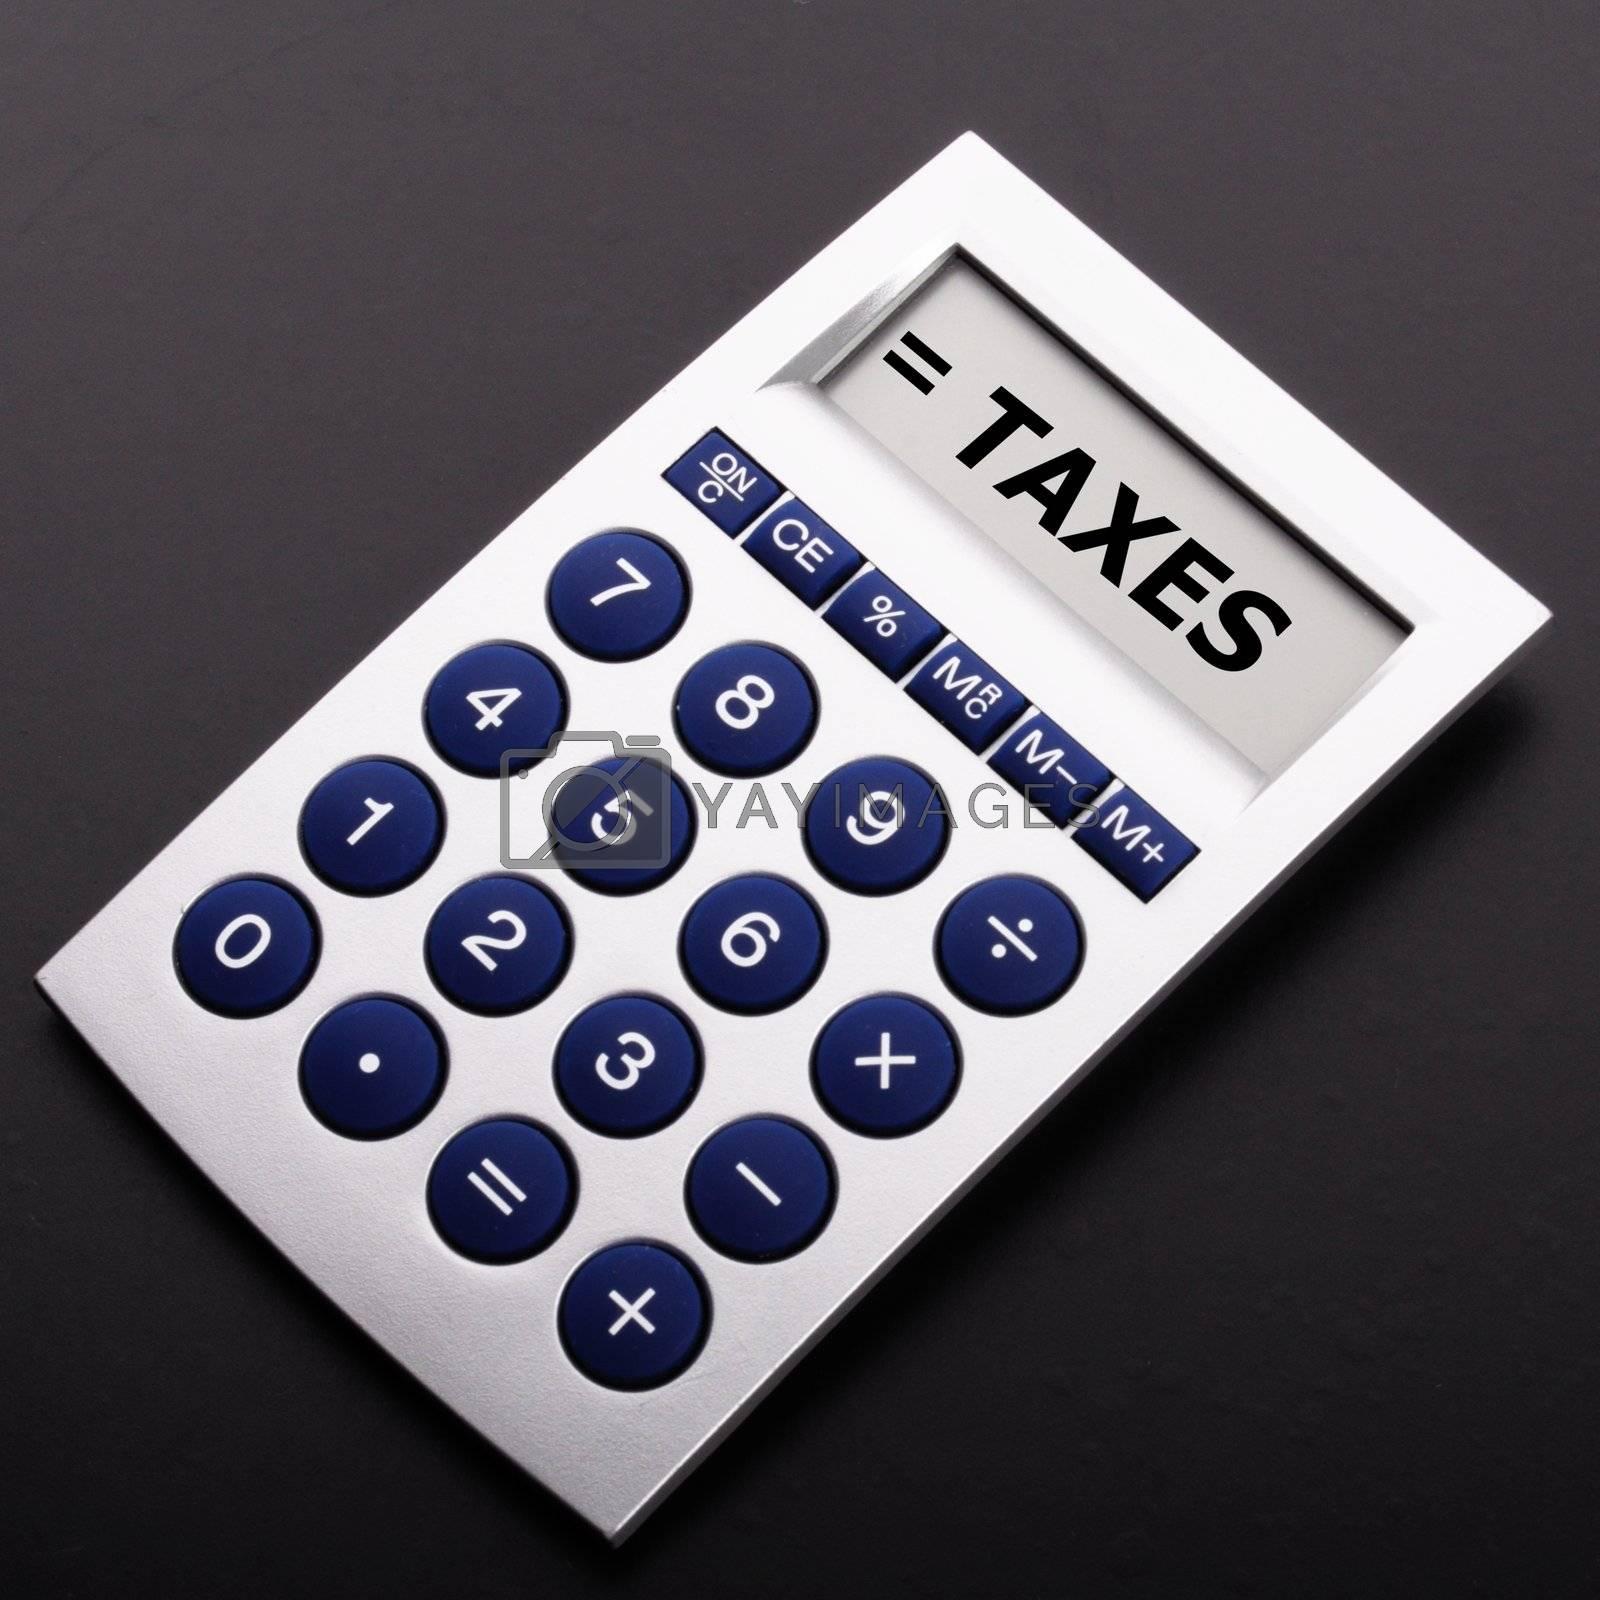 Royalty free image of tax by gunnar3000